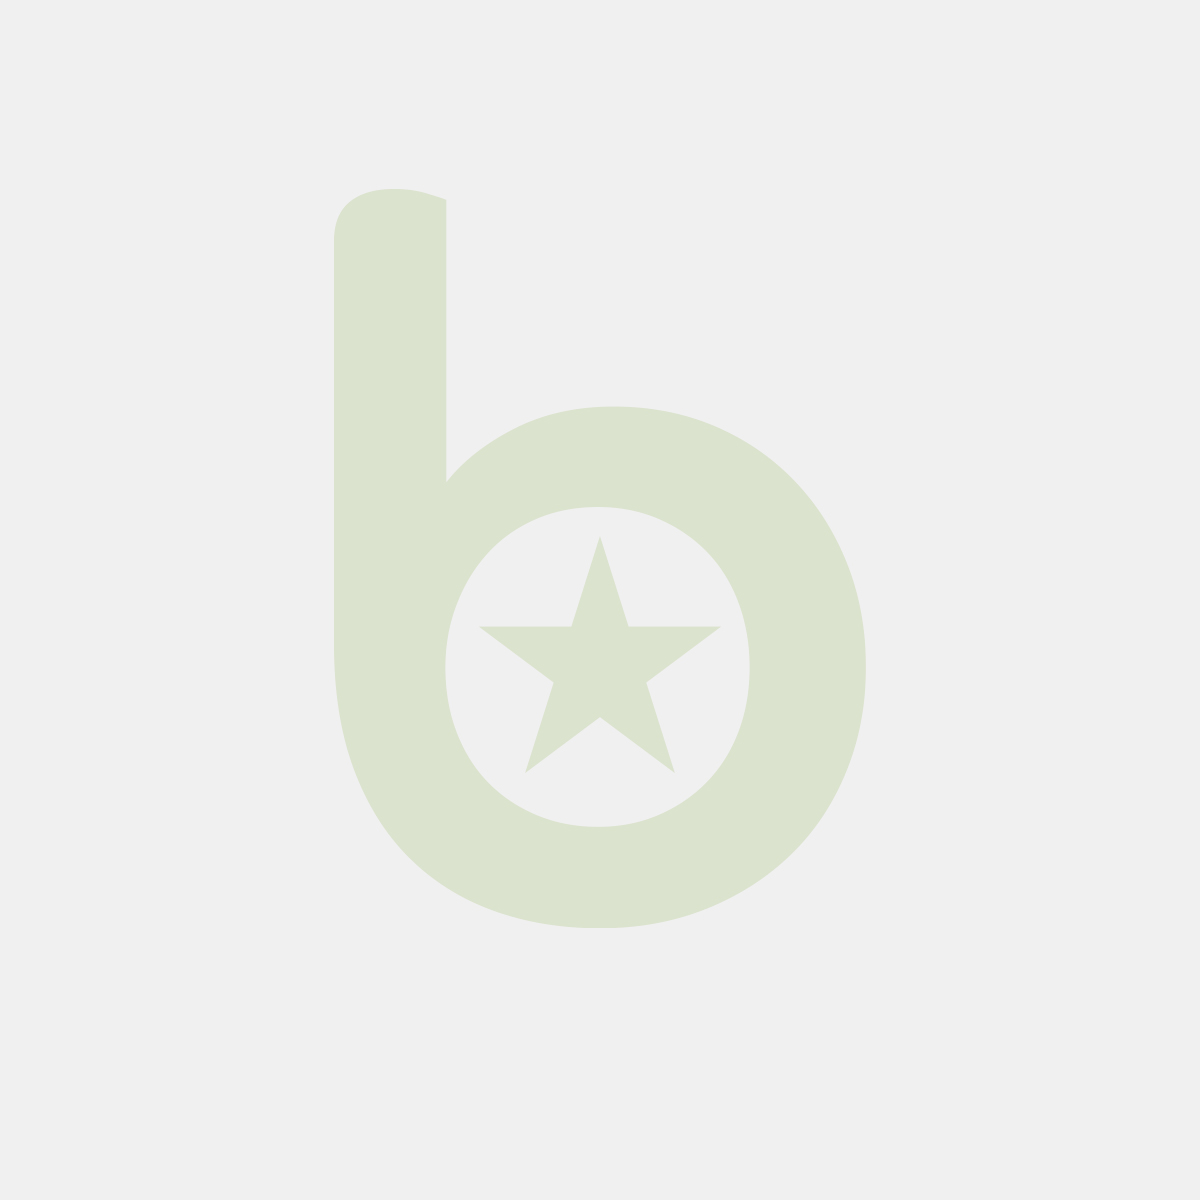 Schładzarka szokowa 7xGN 1/1 - kod 232194